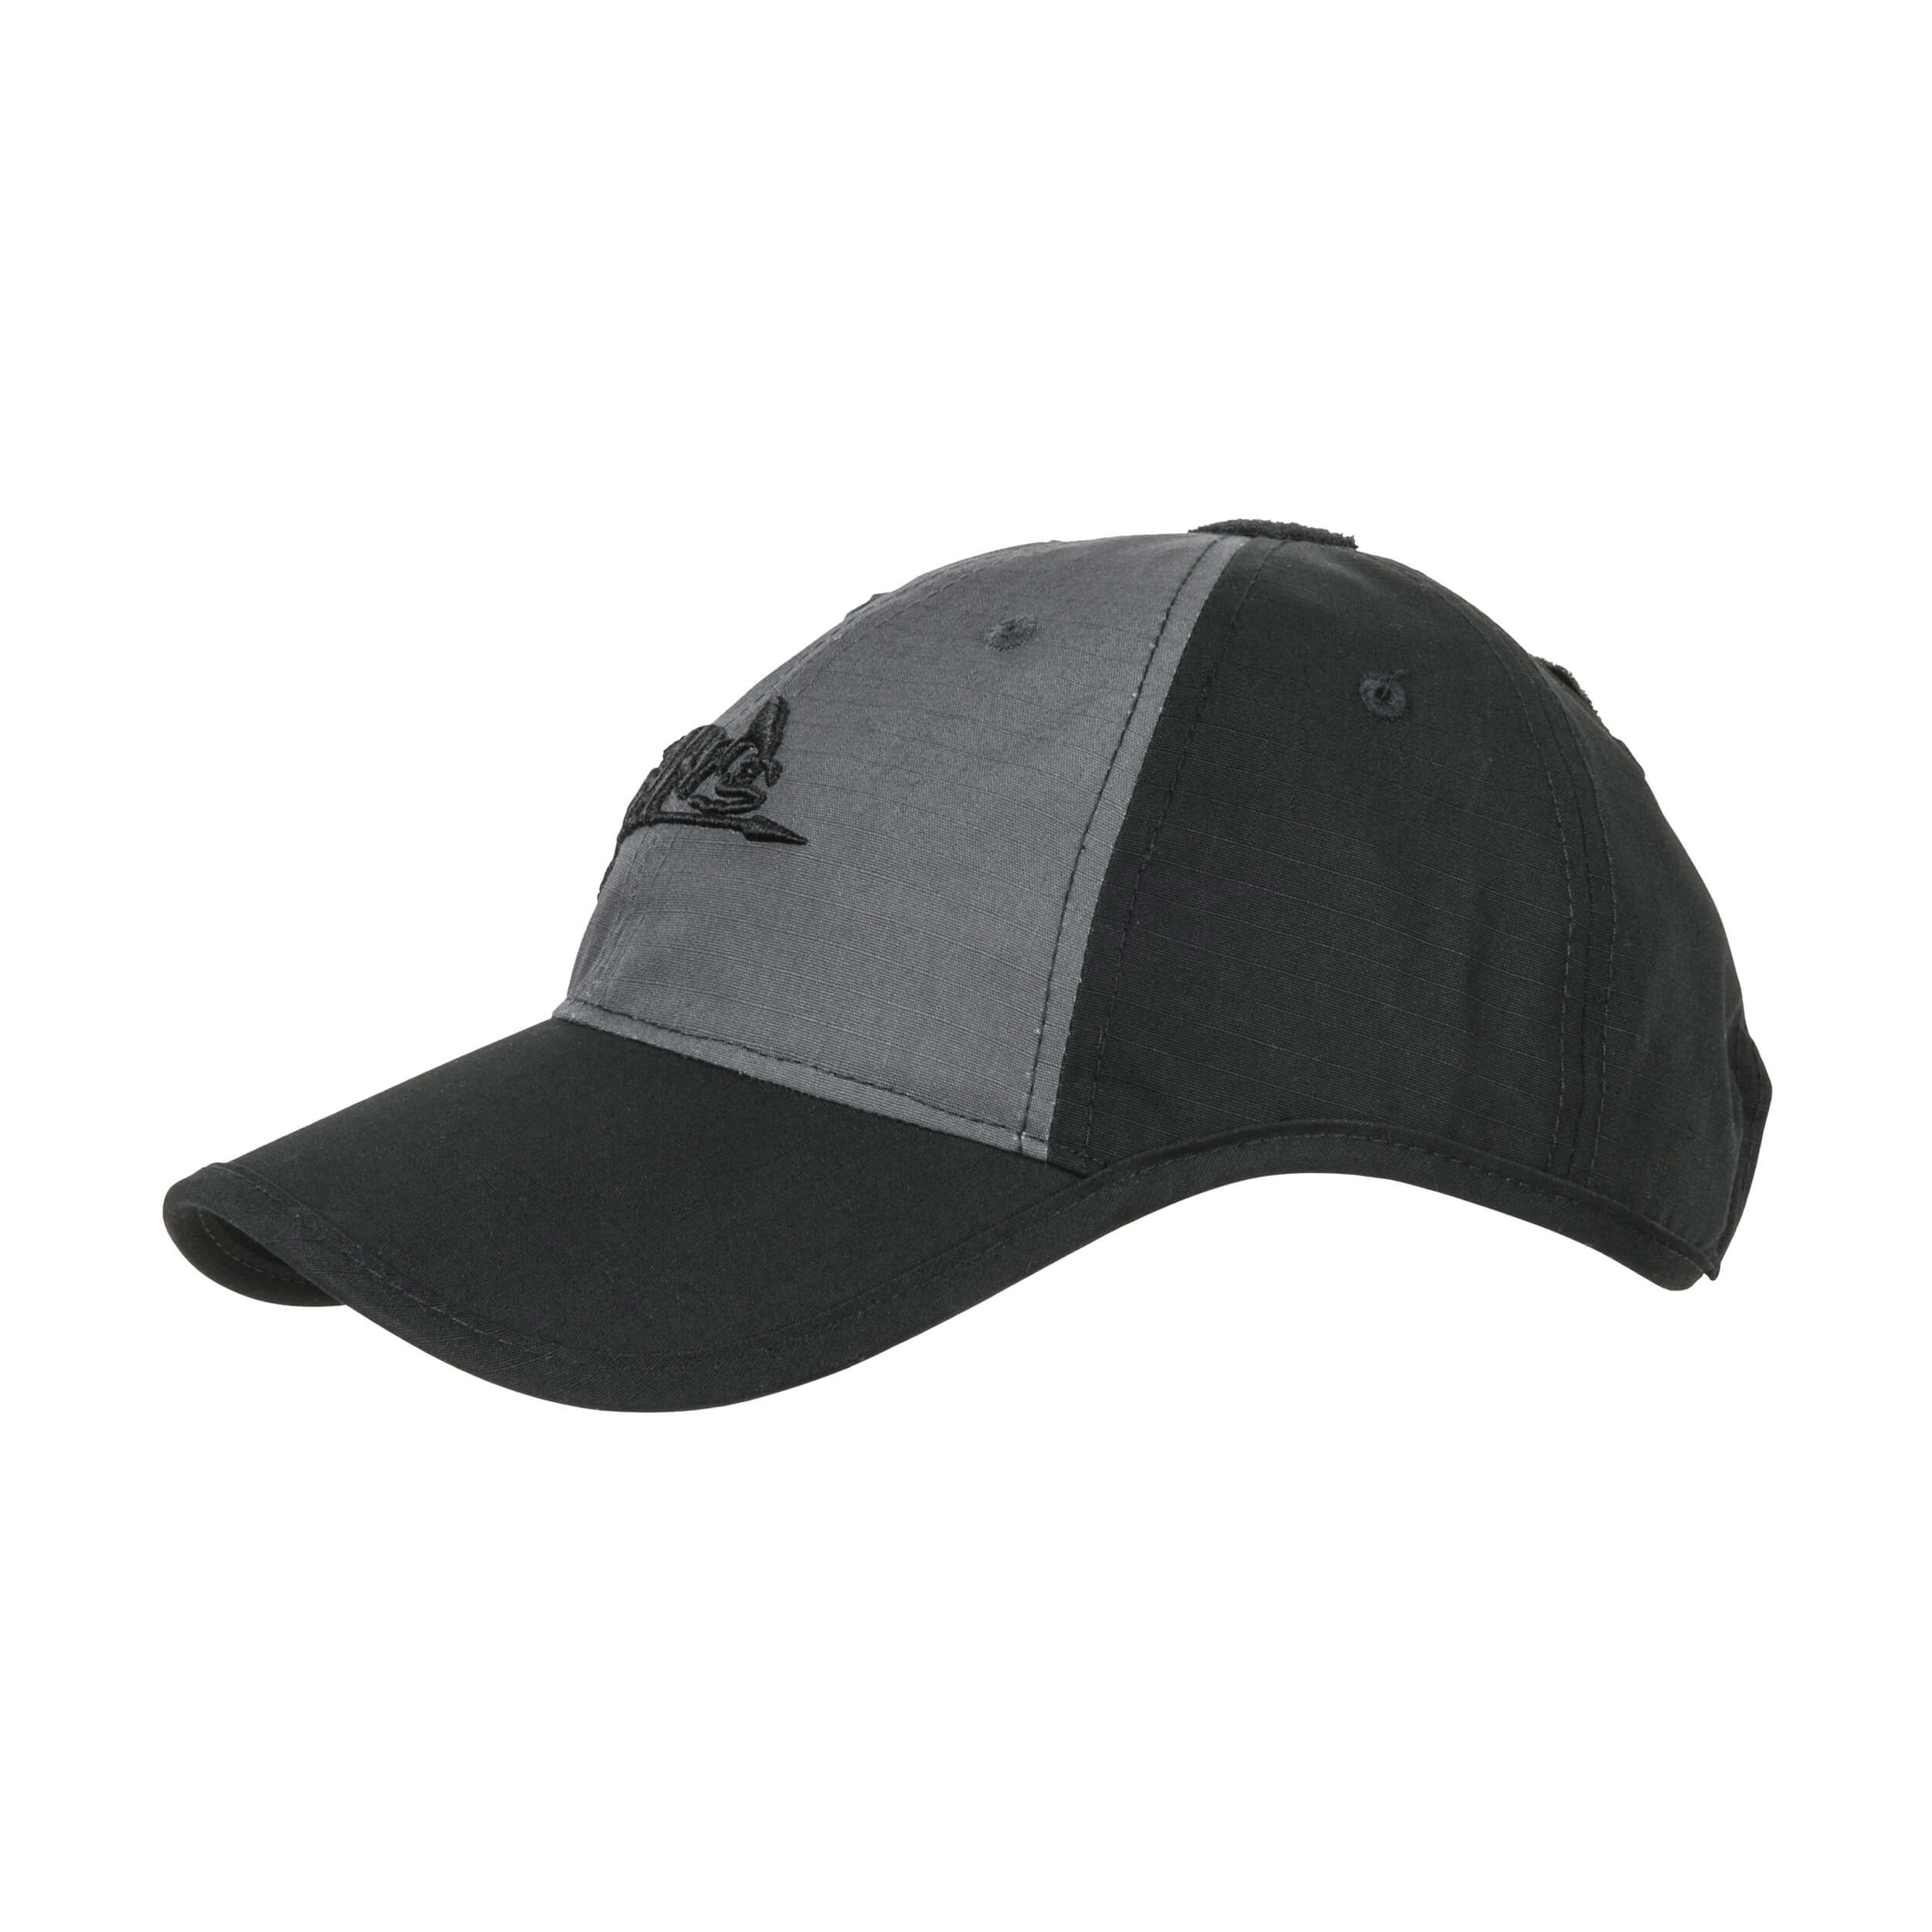 Helikon-Tex Logo Cap -PolyCotton Ripstop- Black / Shadow Grey B